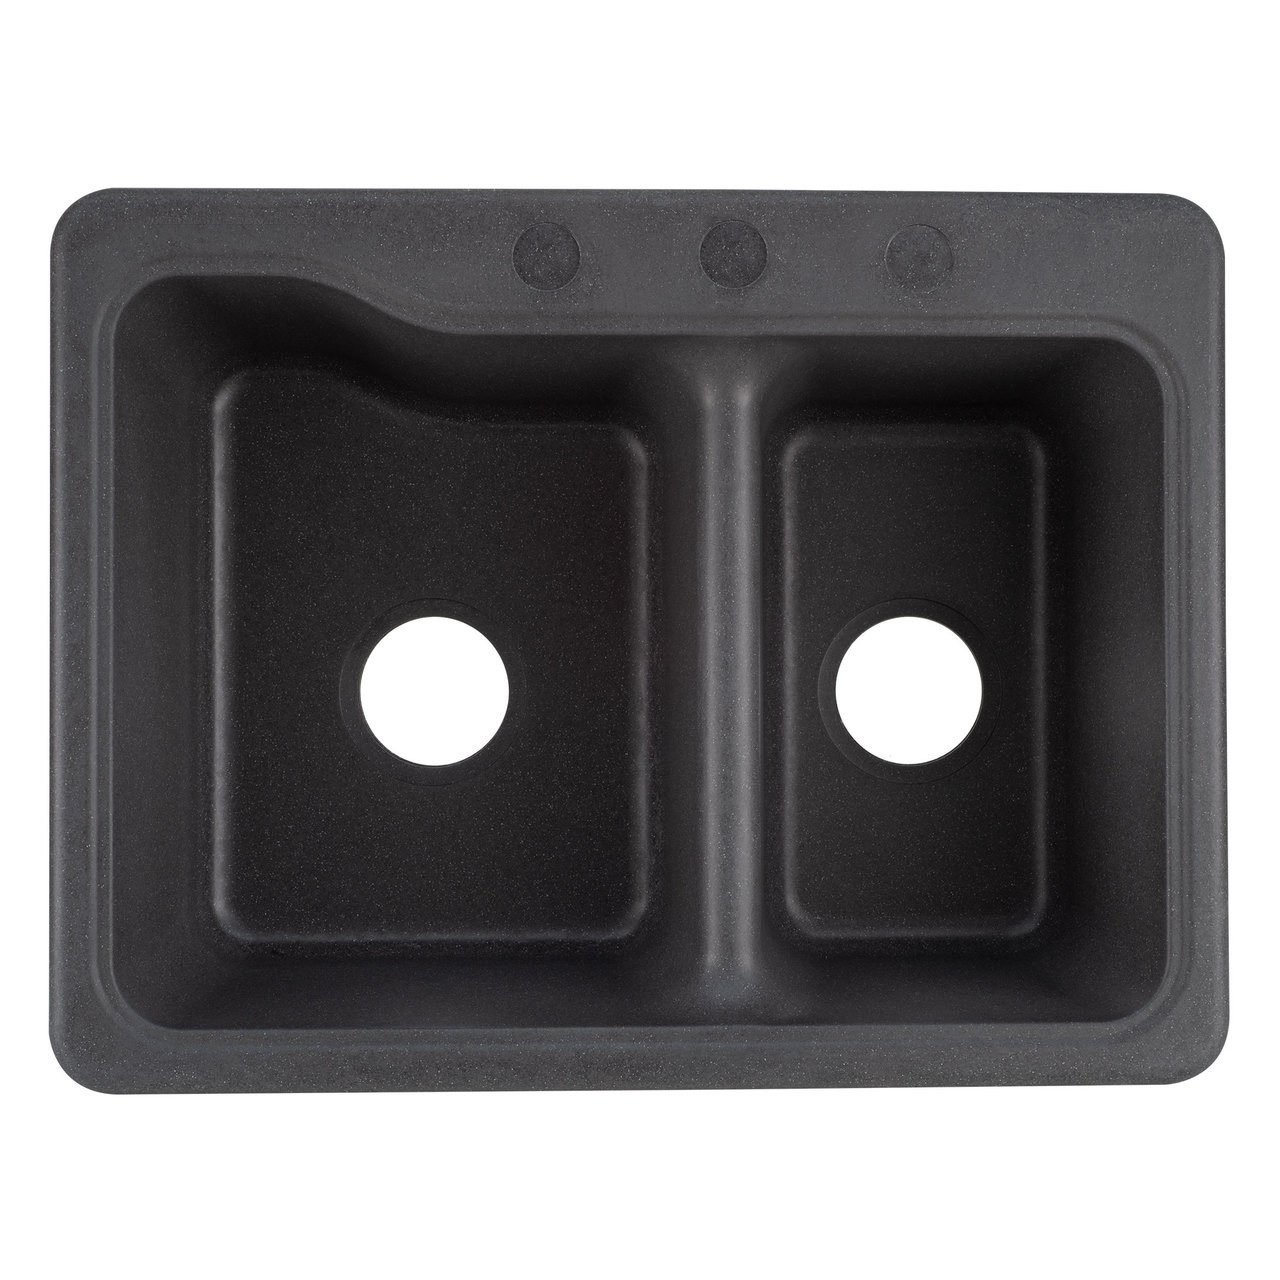 25 x 19 composite rv sink double